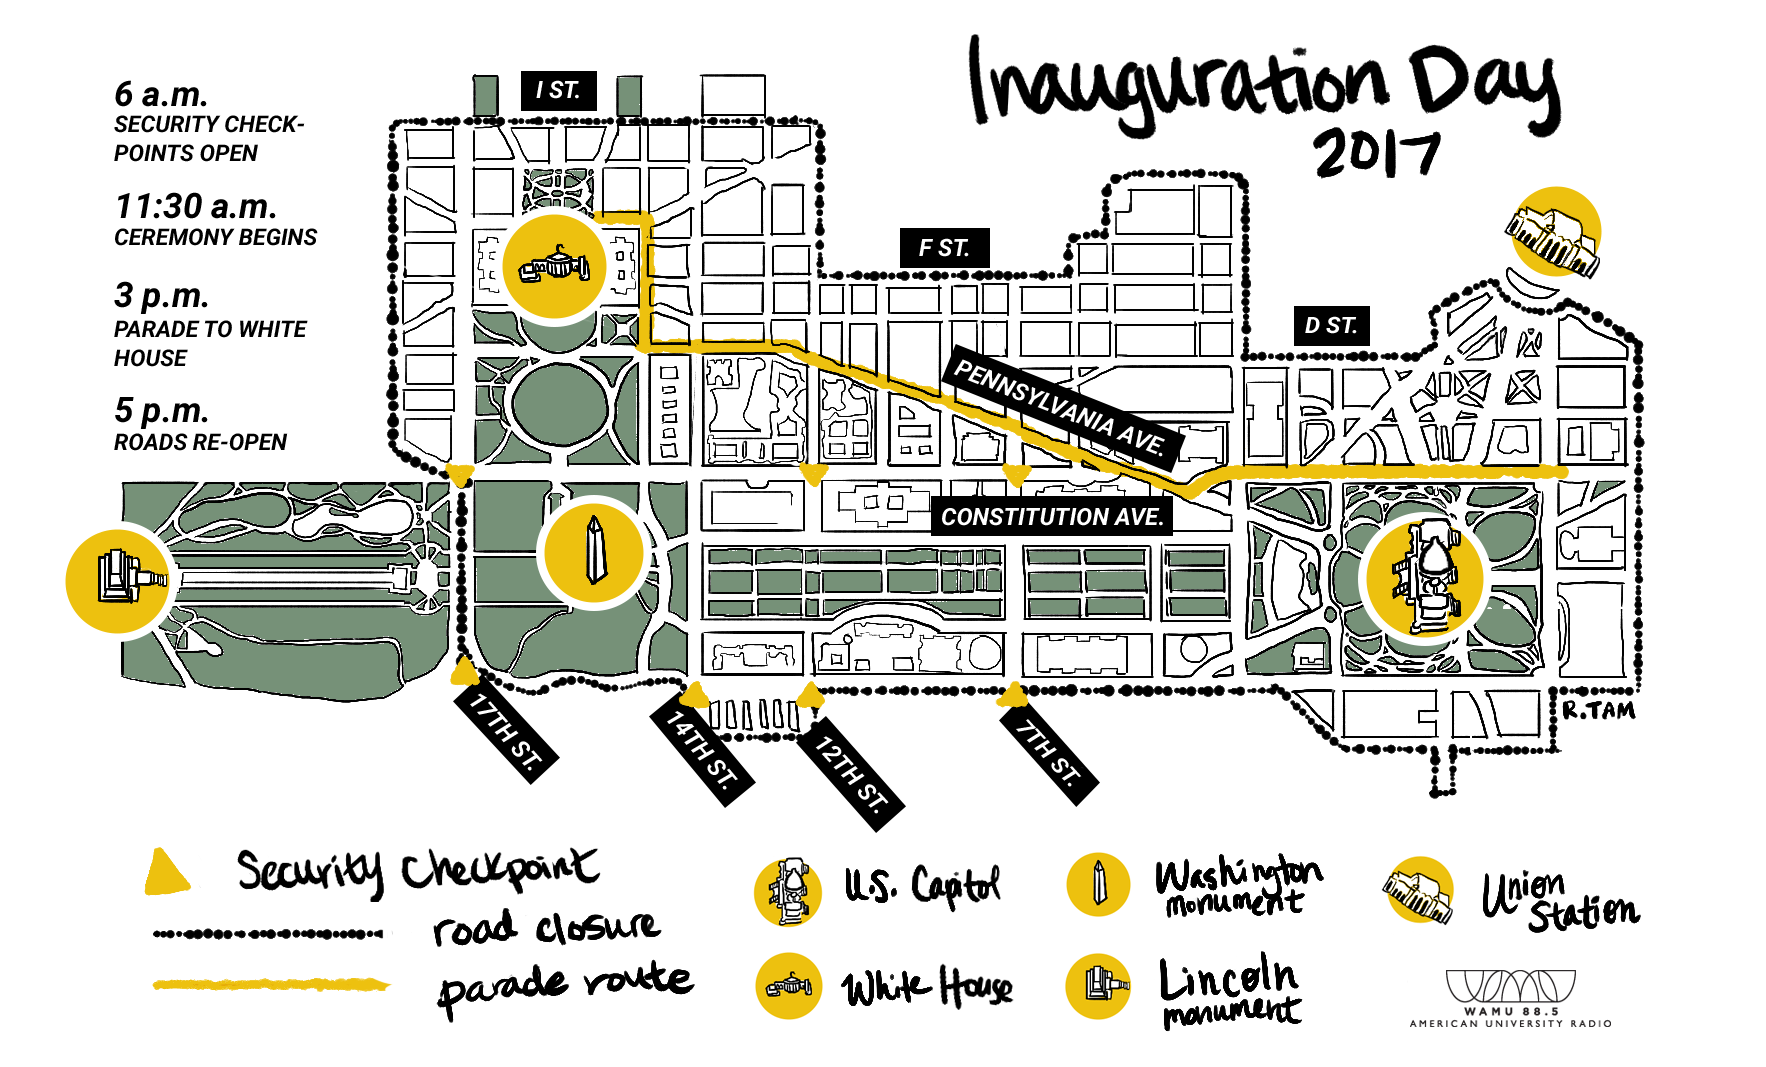 inauguration weekend 2017 what you need to know wamu